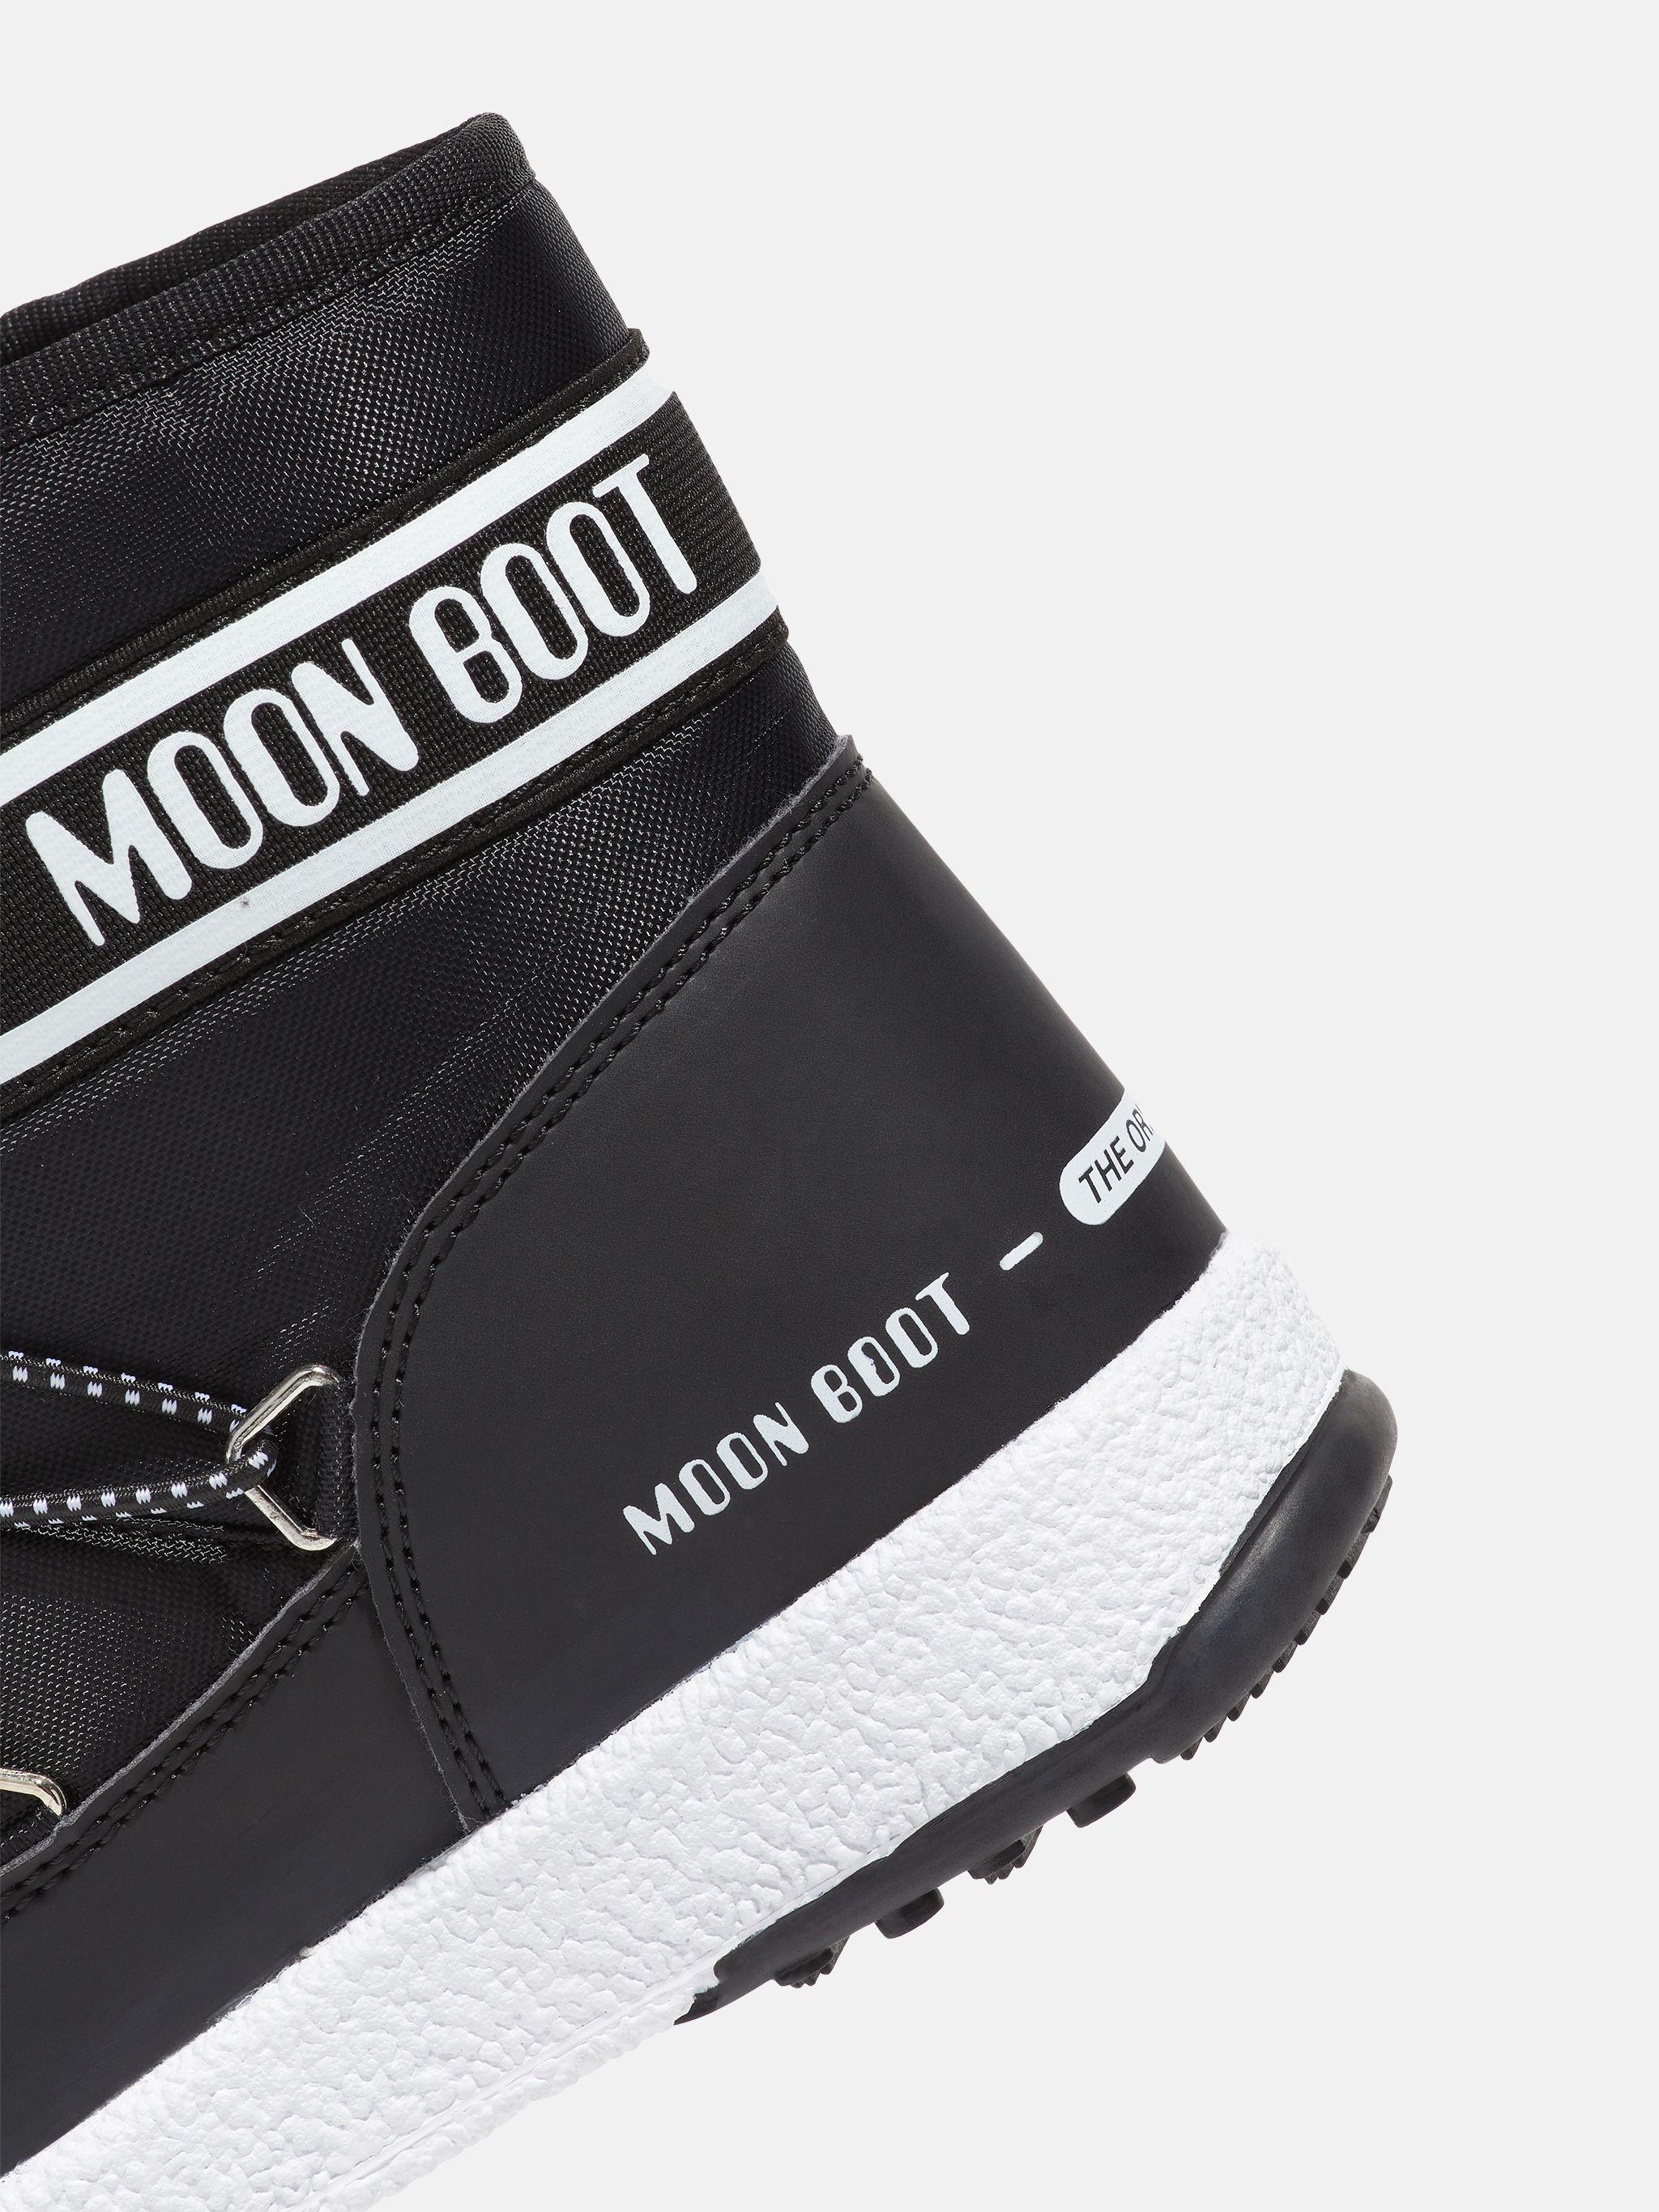 JUNIOR MID BLACK NYLON BOOTS